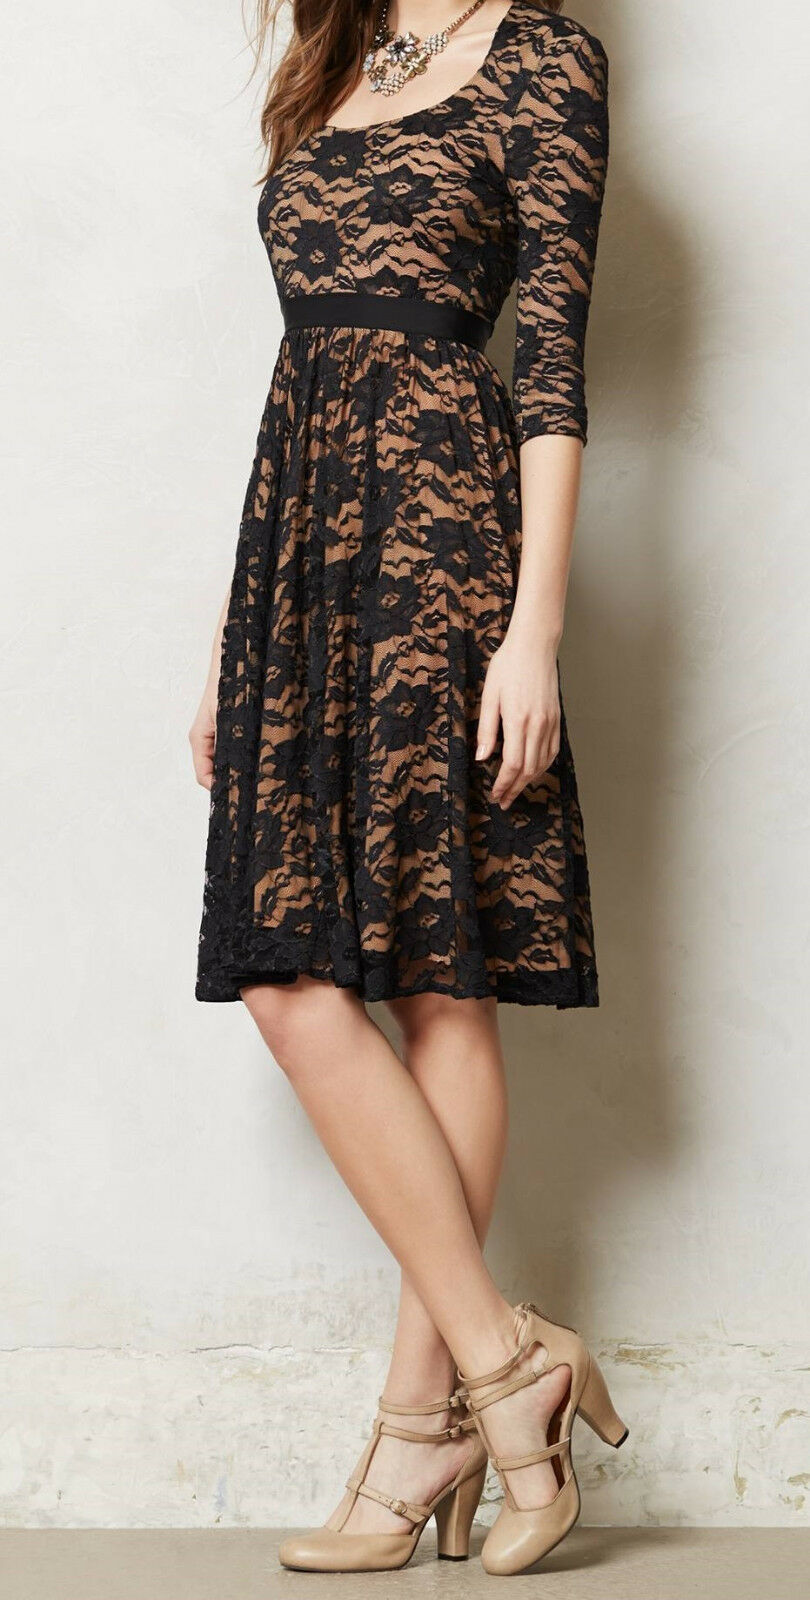 Marc Bouwer Made in Kind Lace Sava Dress Größe 8 schwarz NW ANTHROPOLOGIE Tag